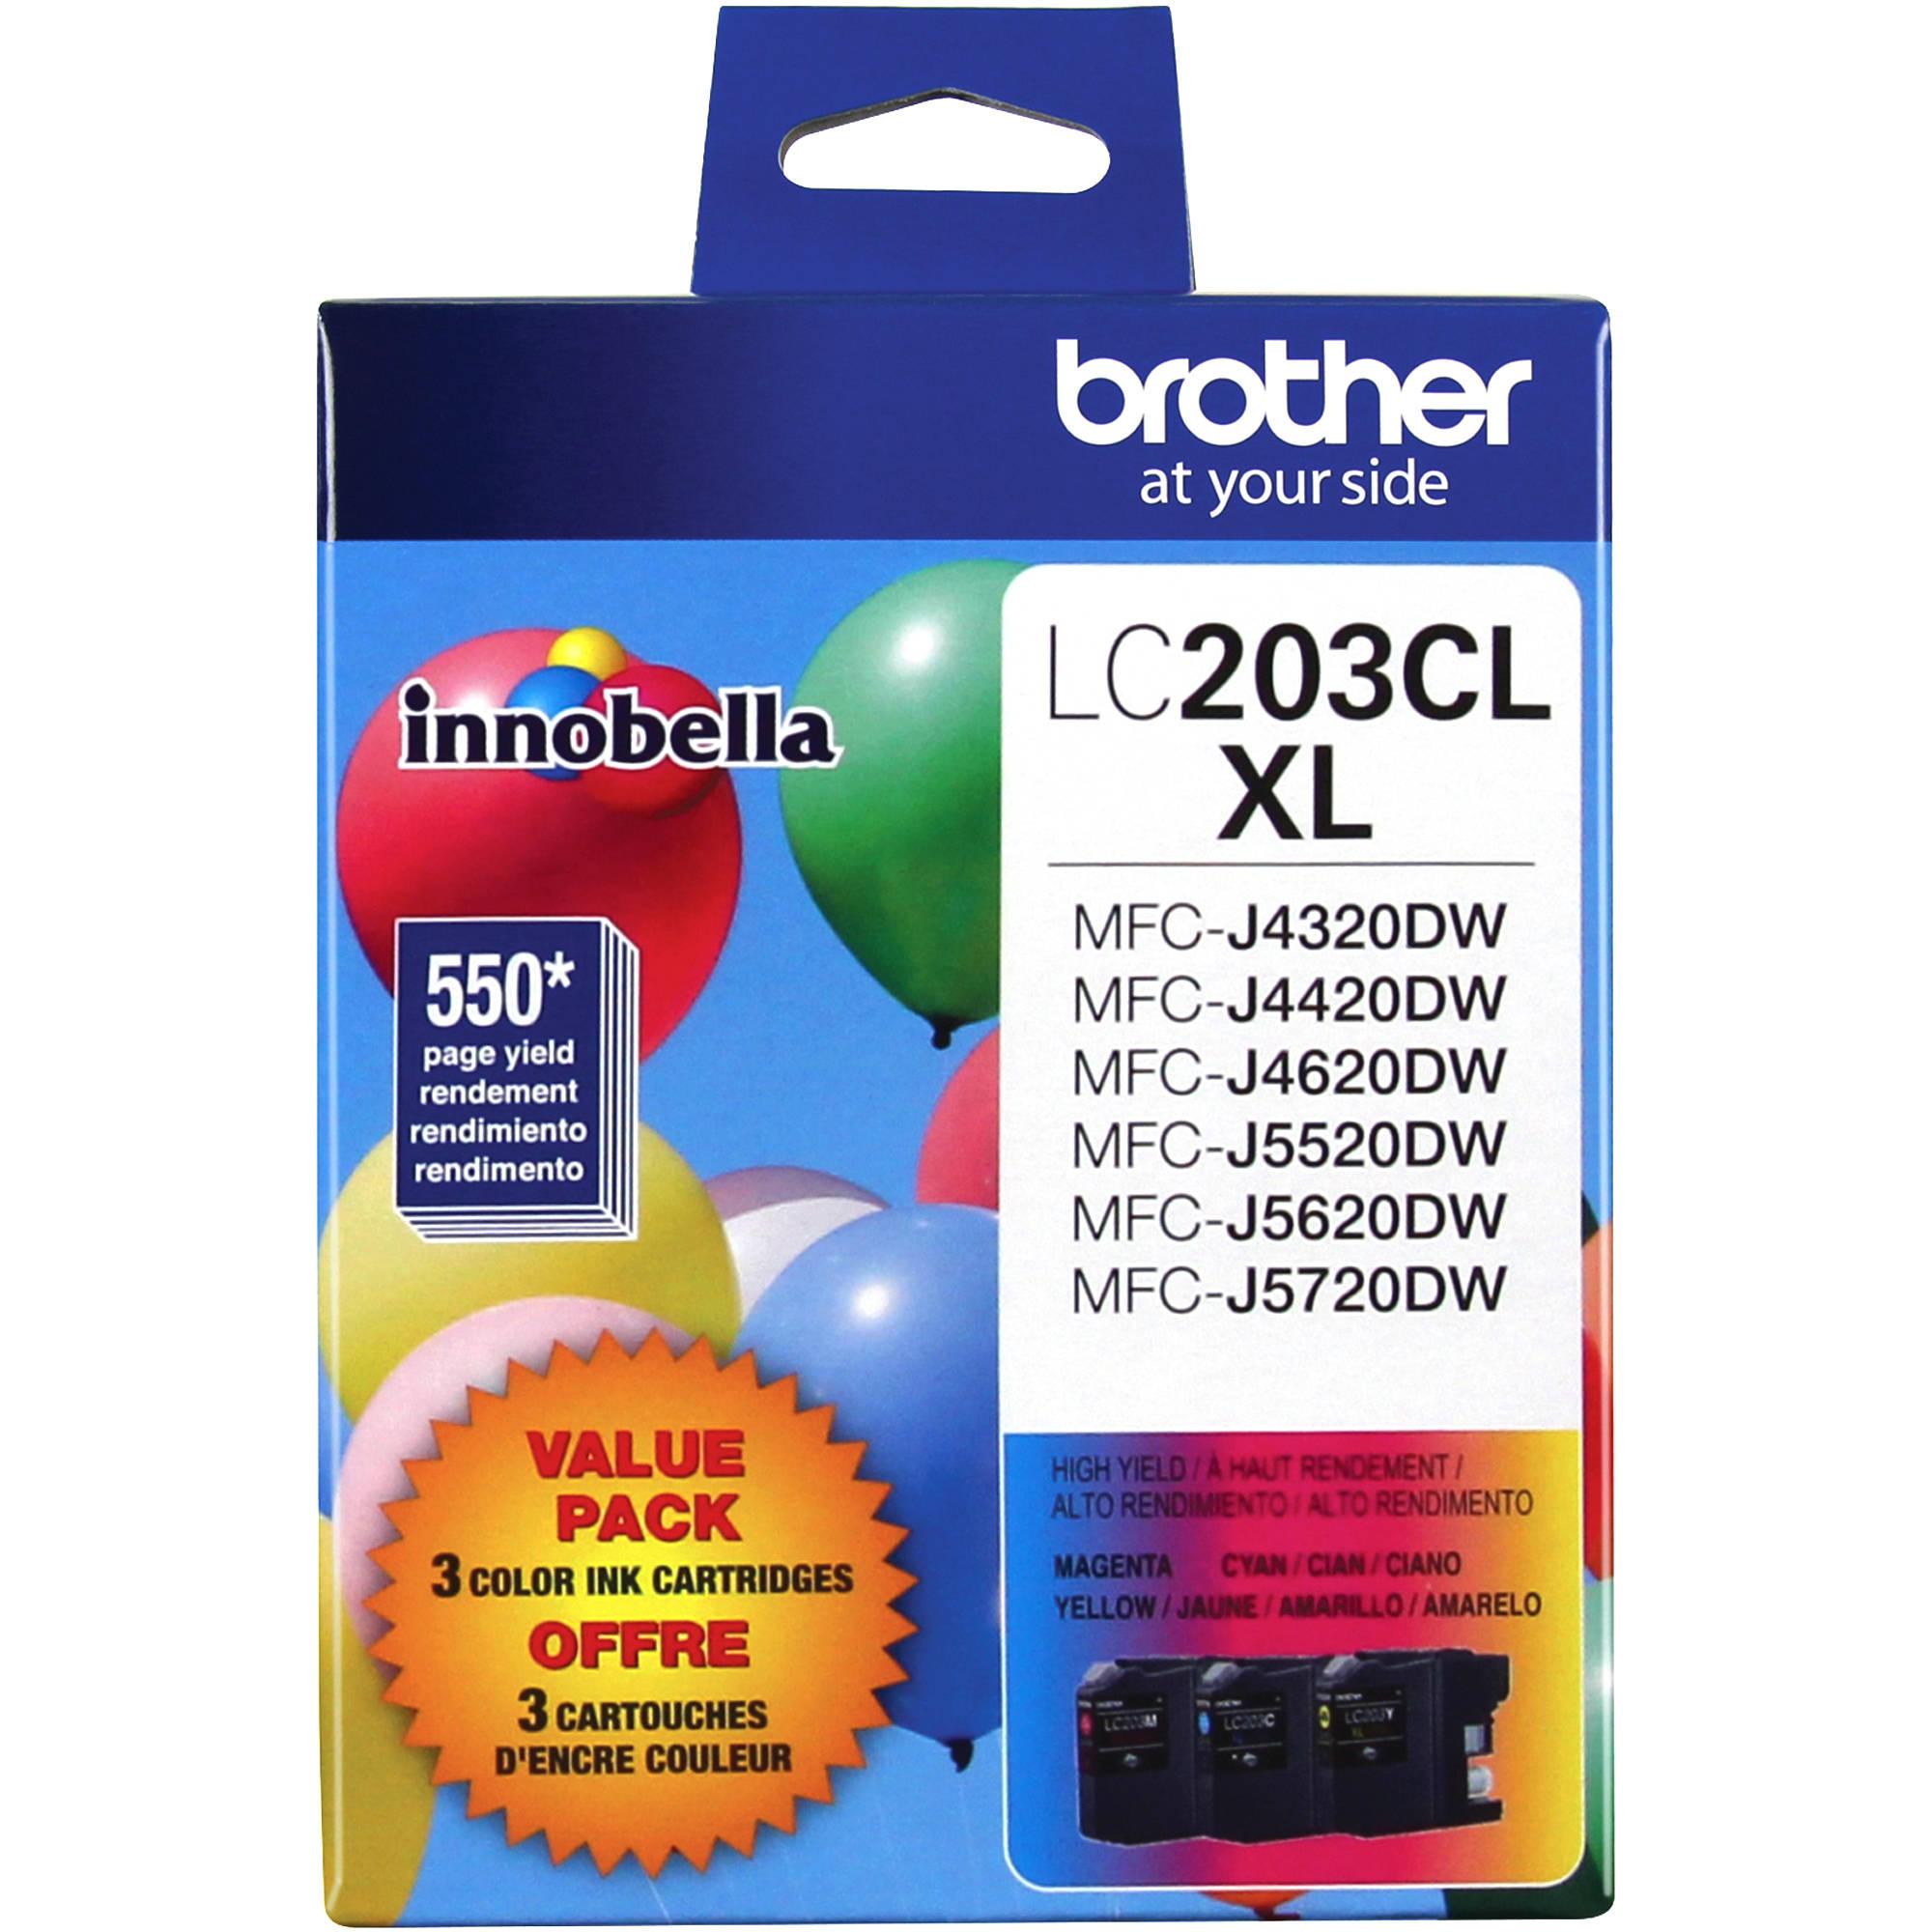 MFC-J5620DW MFC-J5720 Printer Ink cartridge for Brother LC-203 MFC-J5520DW